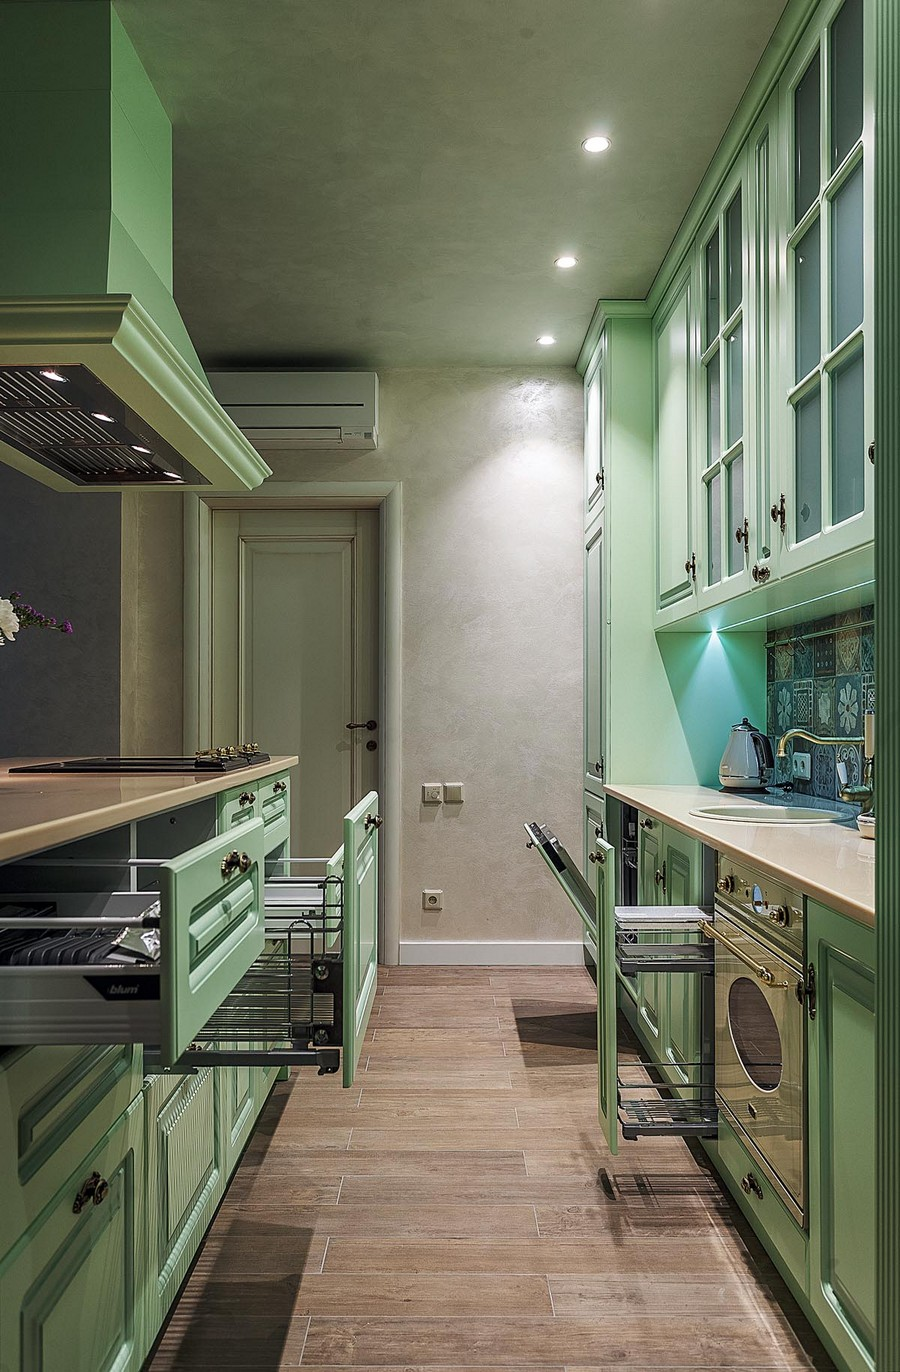 2-pale-mint-green-kitchen-interior-design-in-Mediterranean-style-island-soild-wood-cabinets-beige-worktop-cooker-hood-glass-cabinets-drawers-stove-brass-faucet-handles-rails